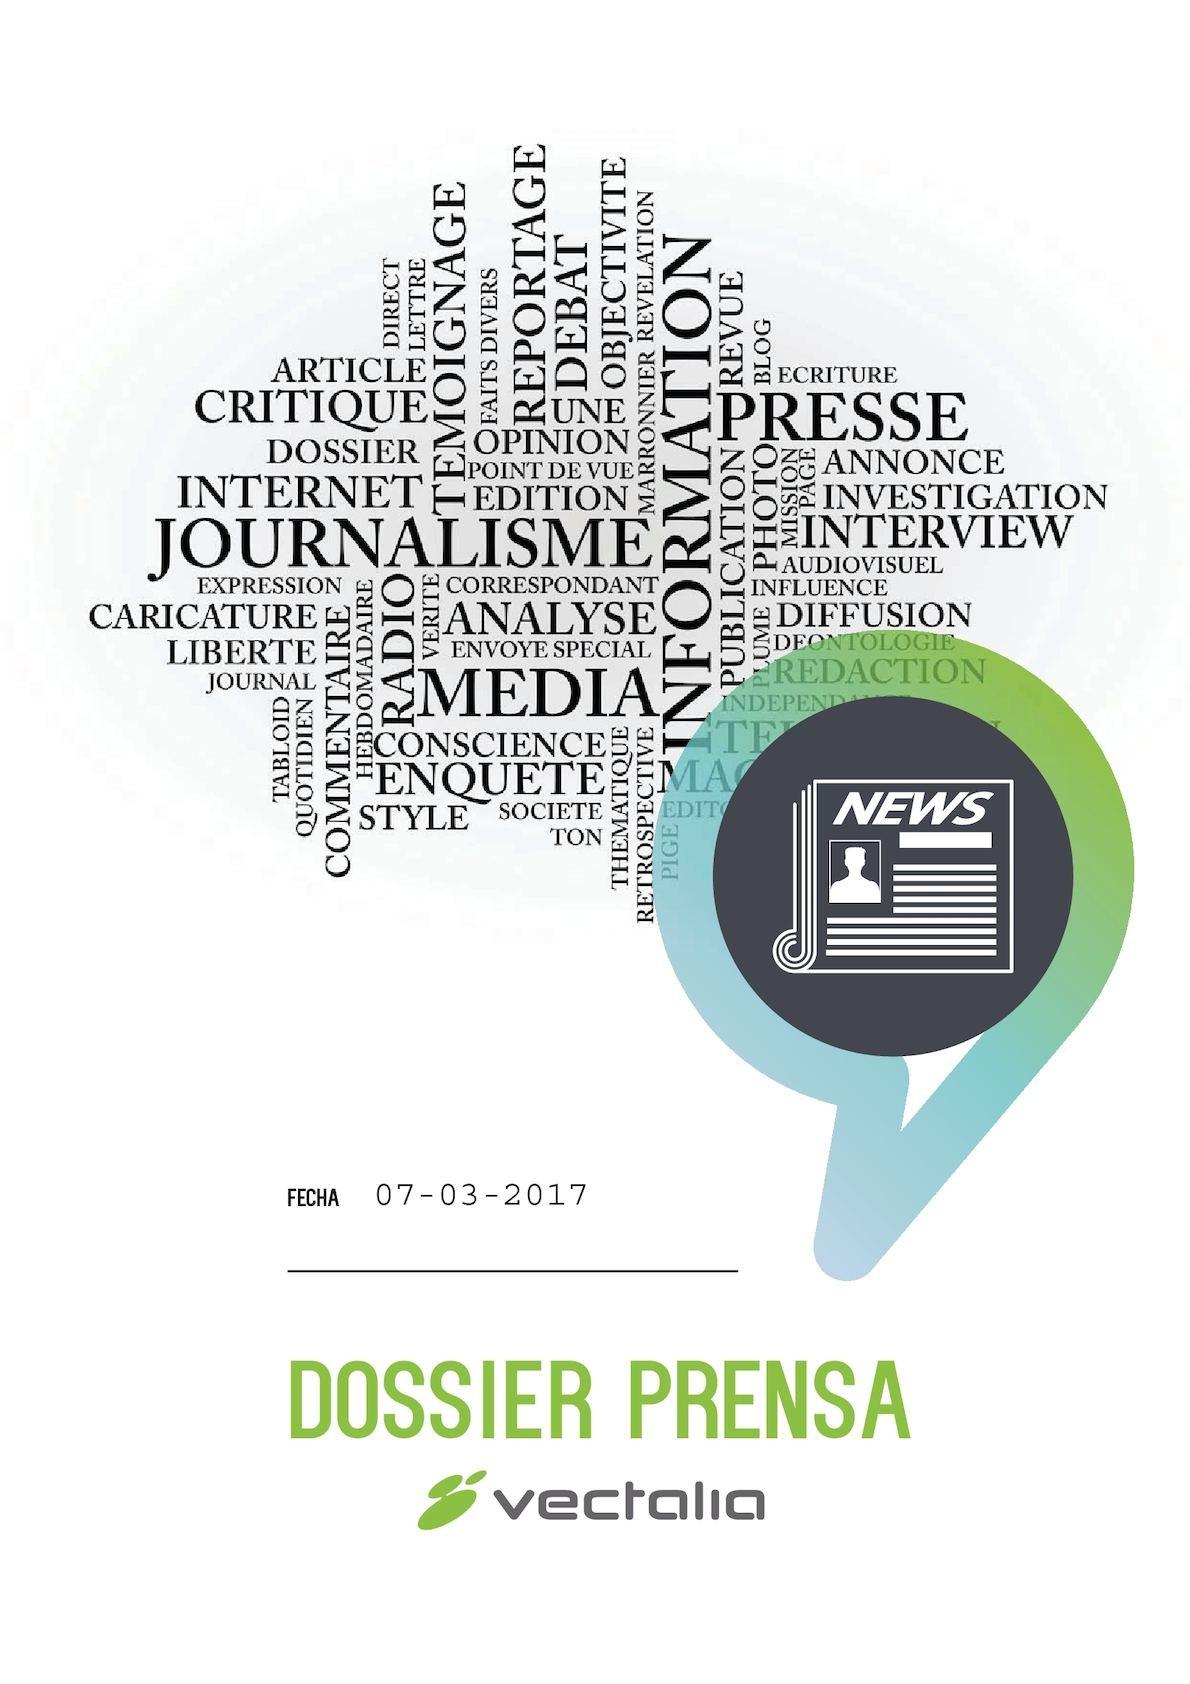 Calendario Escolar 2019 Parla Más Reciente Calaméo Dossier Prensa Martes 7 De Marzo De 2017 Of Calendario Escolar 2019 Parla Más Actual 2017 09 07t06 58